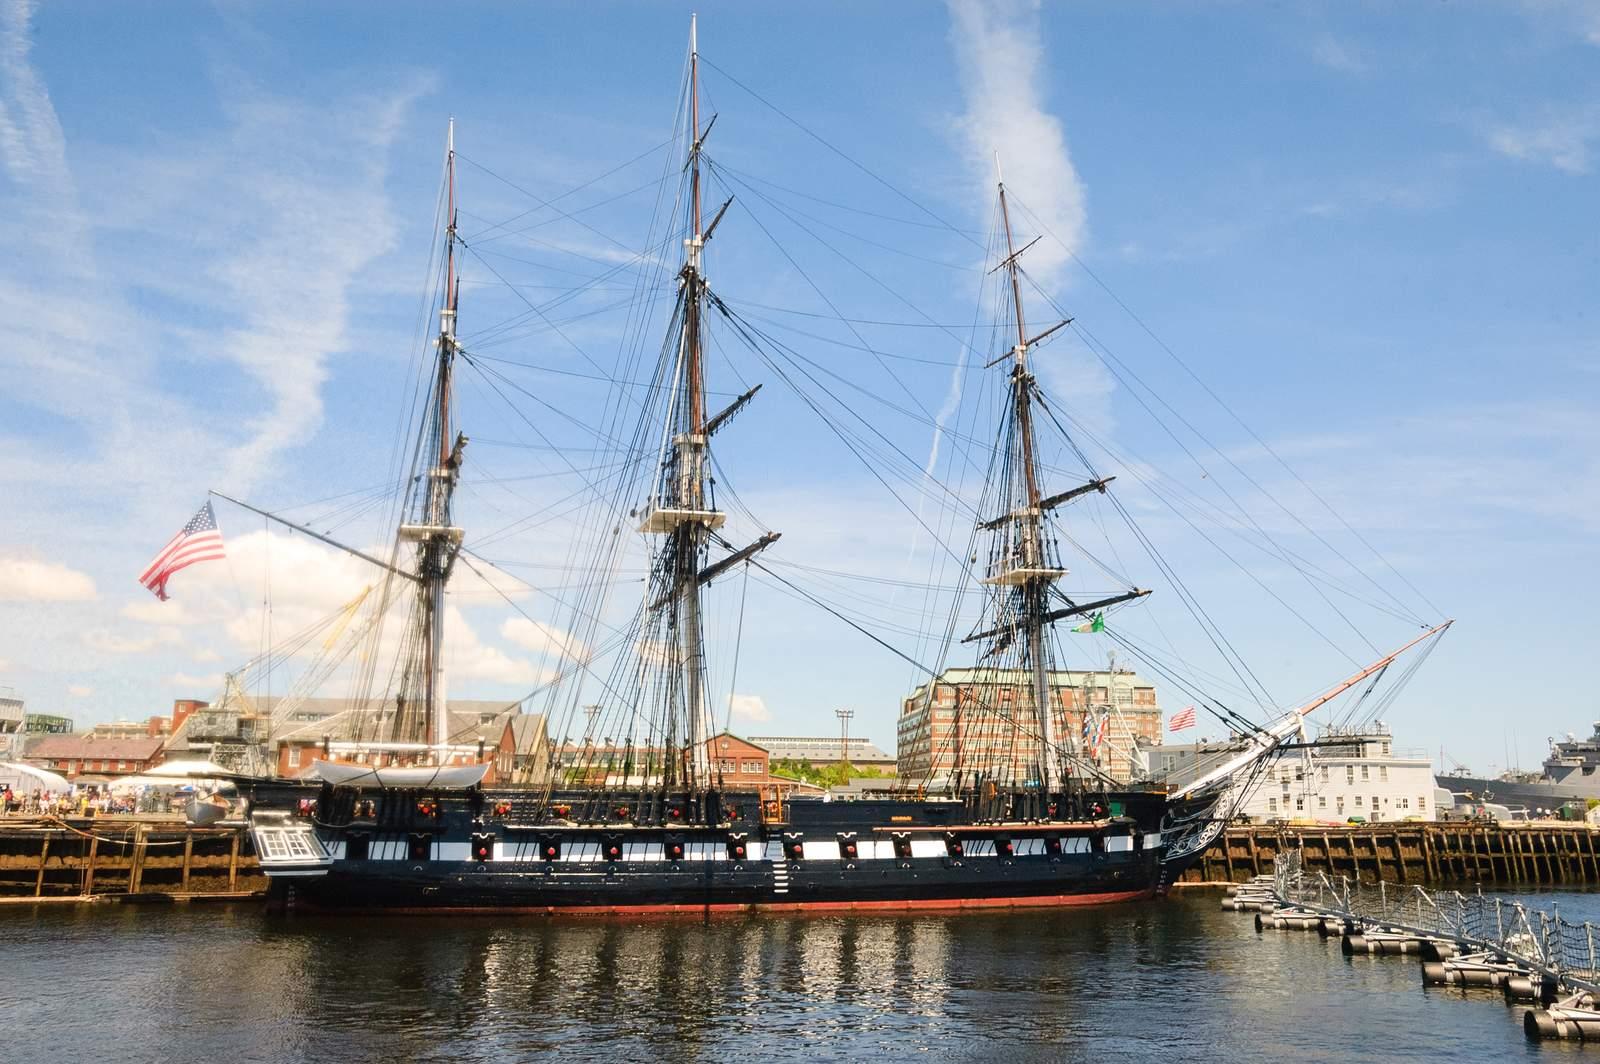 USS Constitution, Charlestown, Boston, Massachusetts